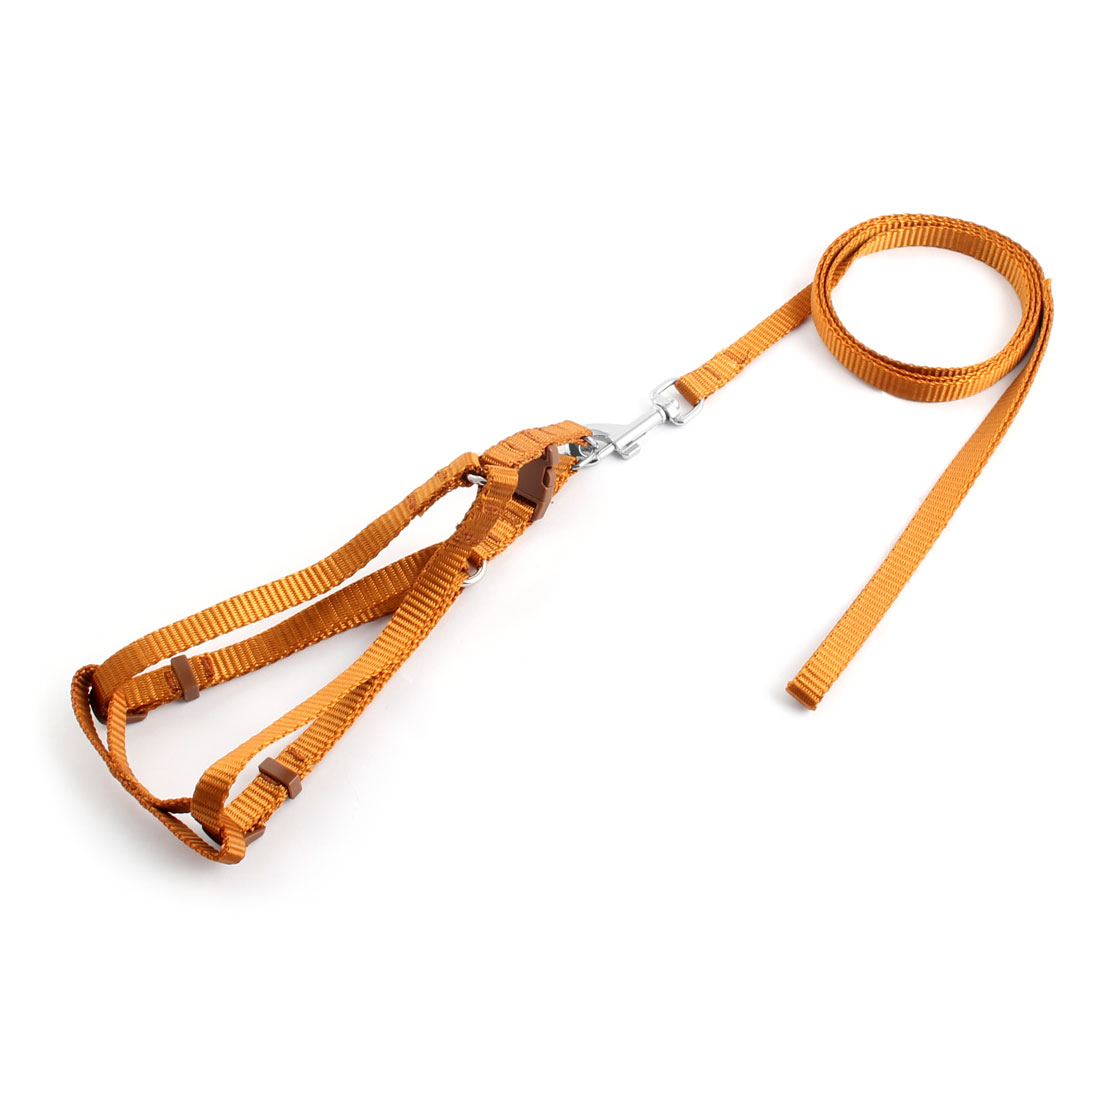 Dog Nylon Buckle Design Adjustable Strap Rope Lead Collar Set Harness Leash Brown